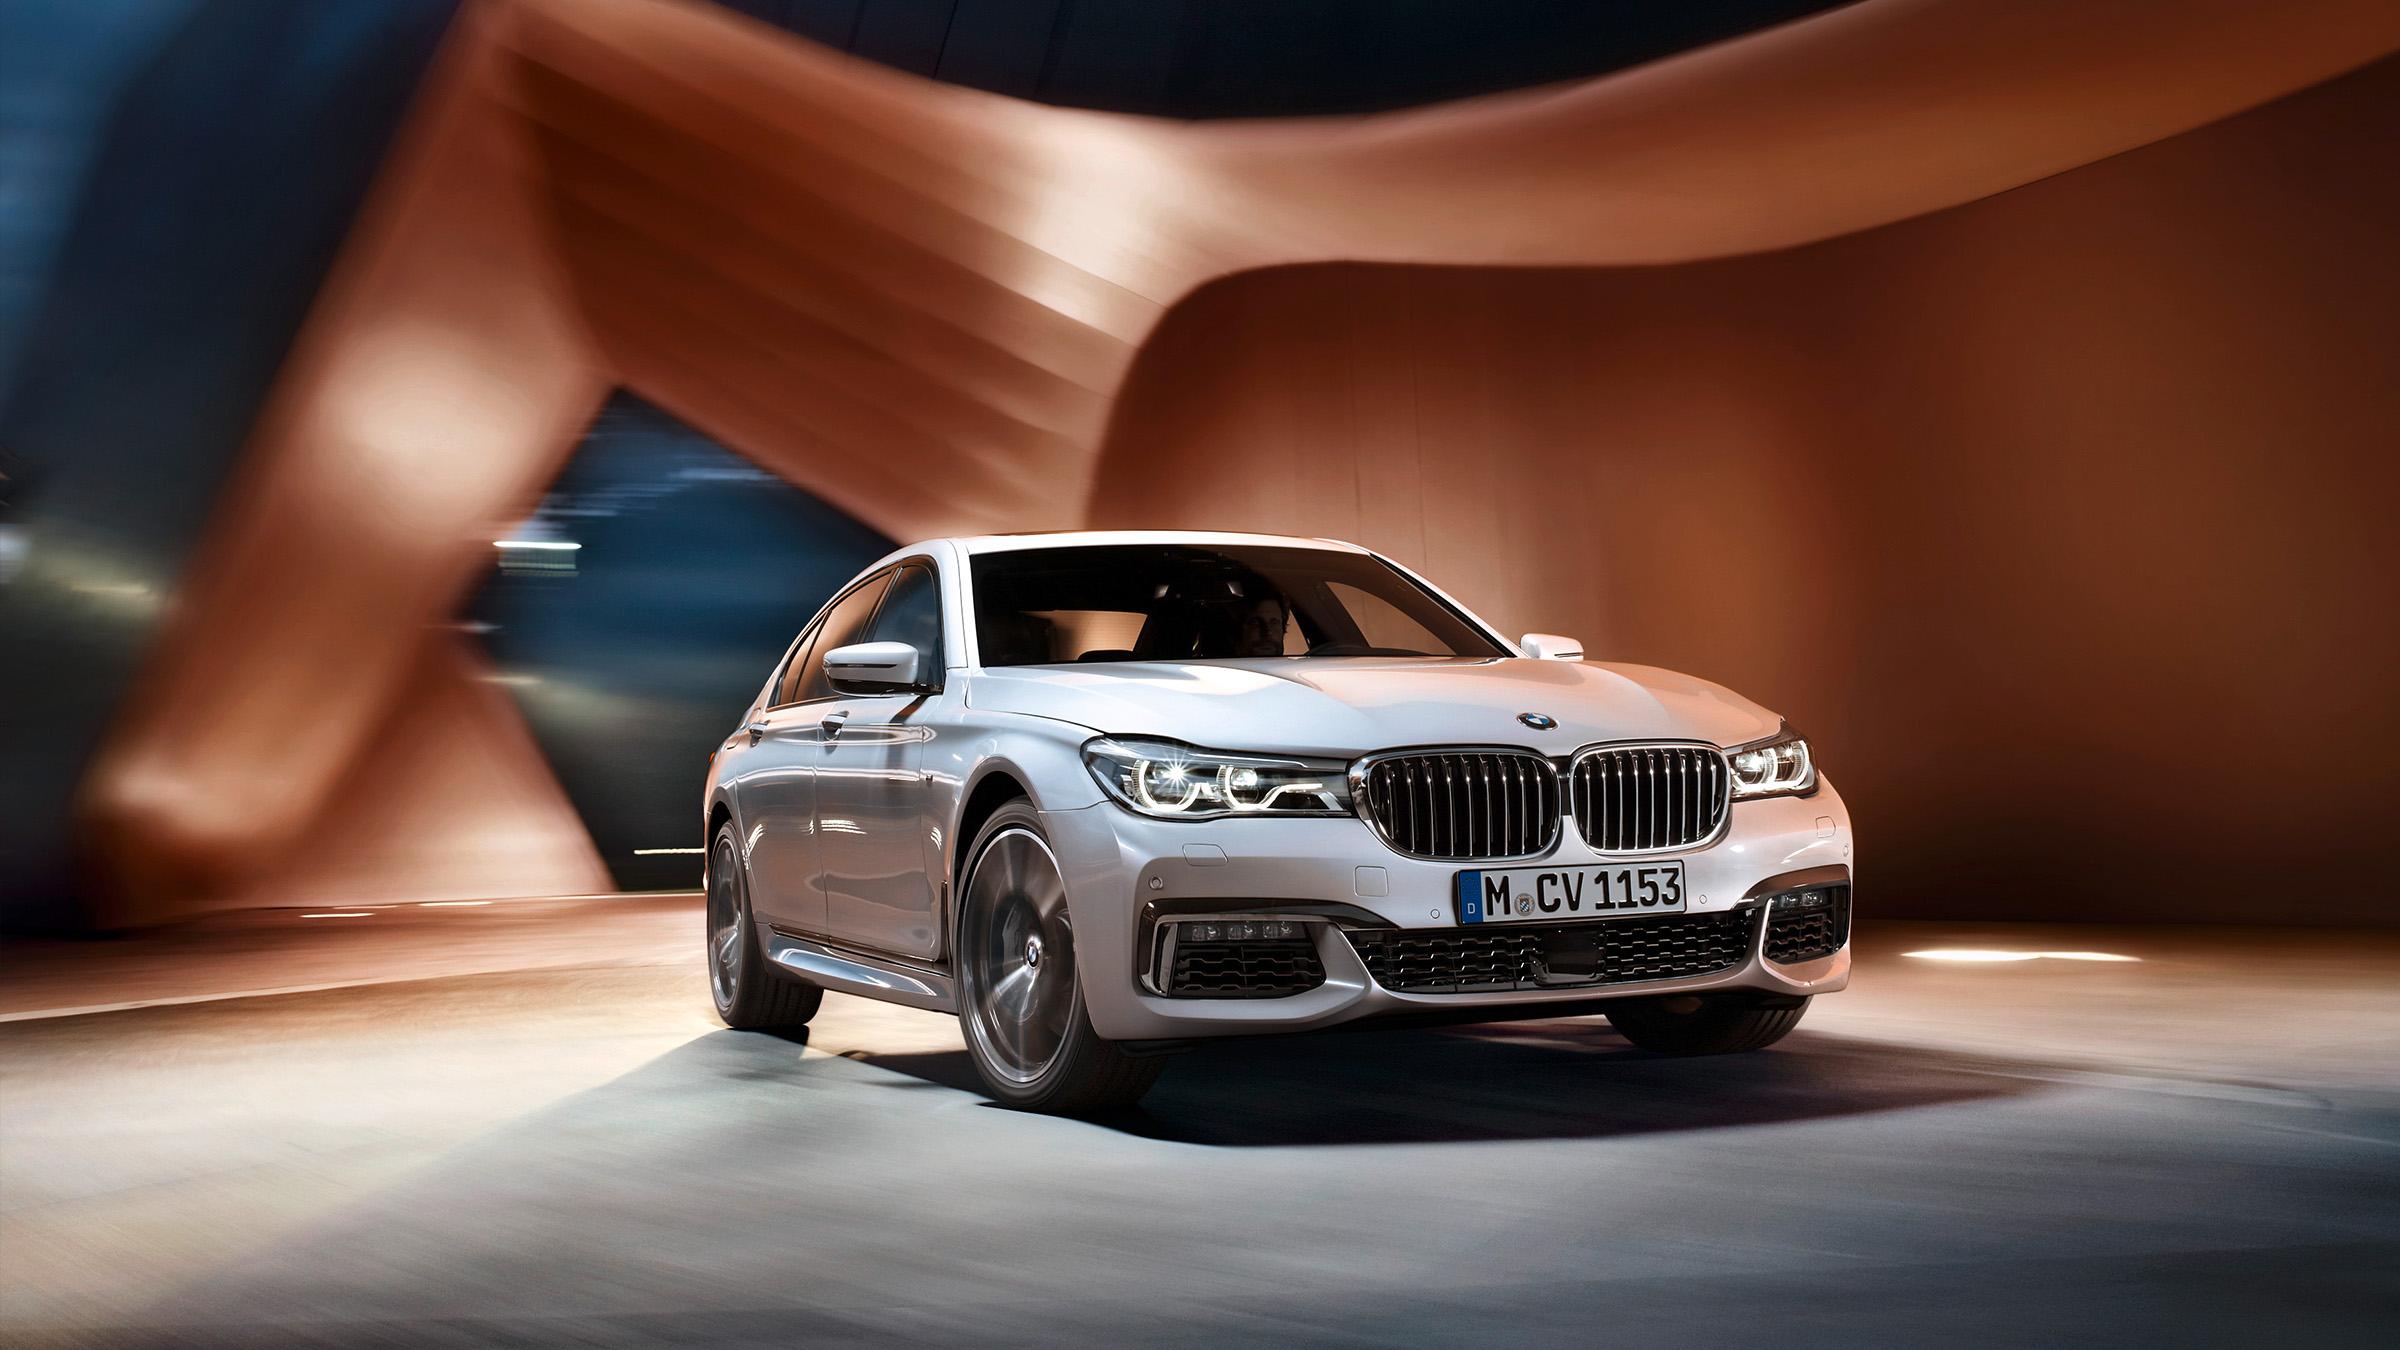 BMW_7ER_EMIR_HAVERIC_09_2400